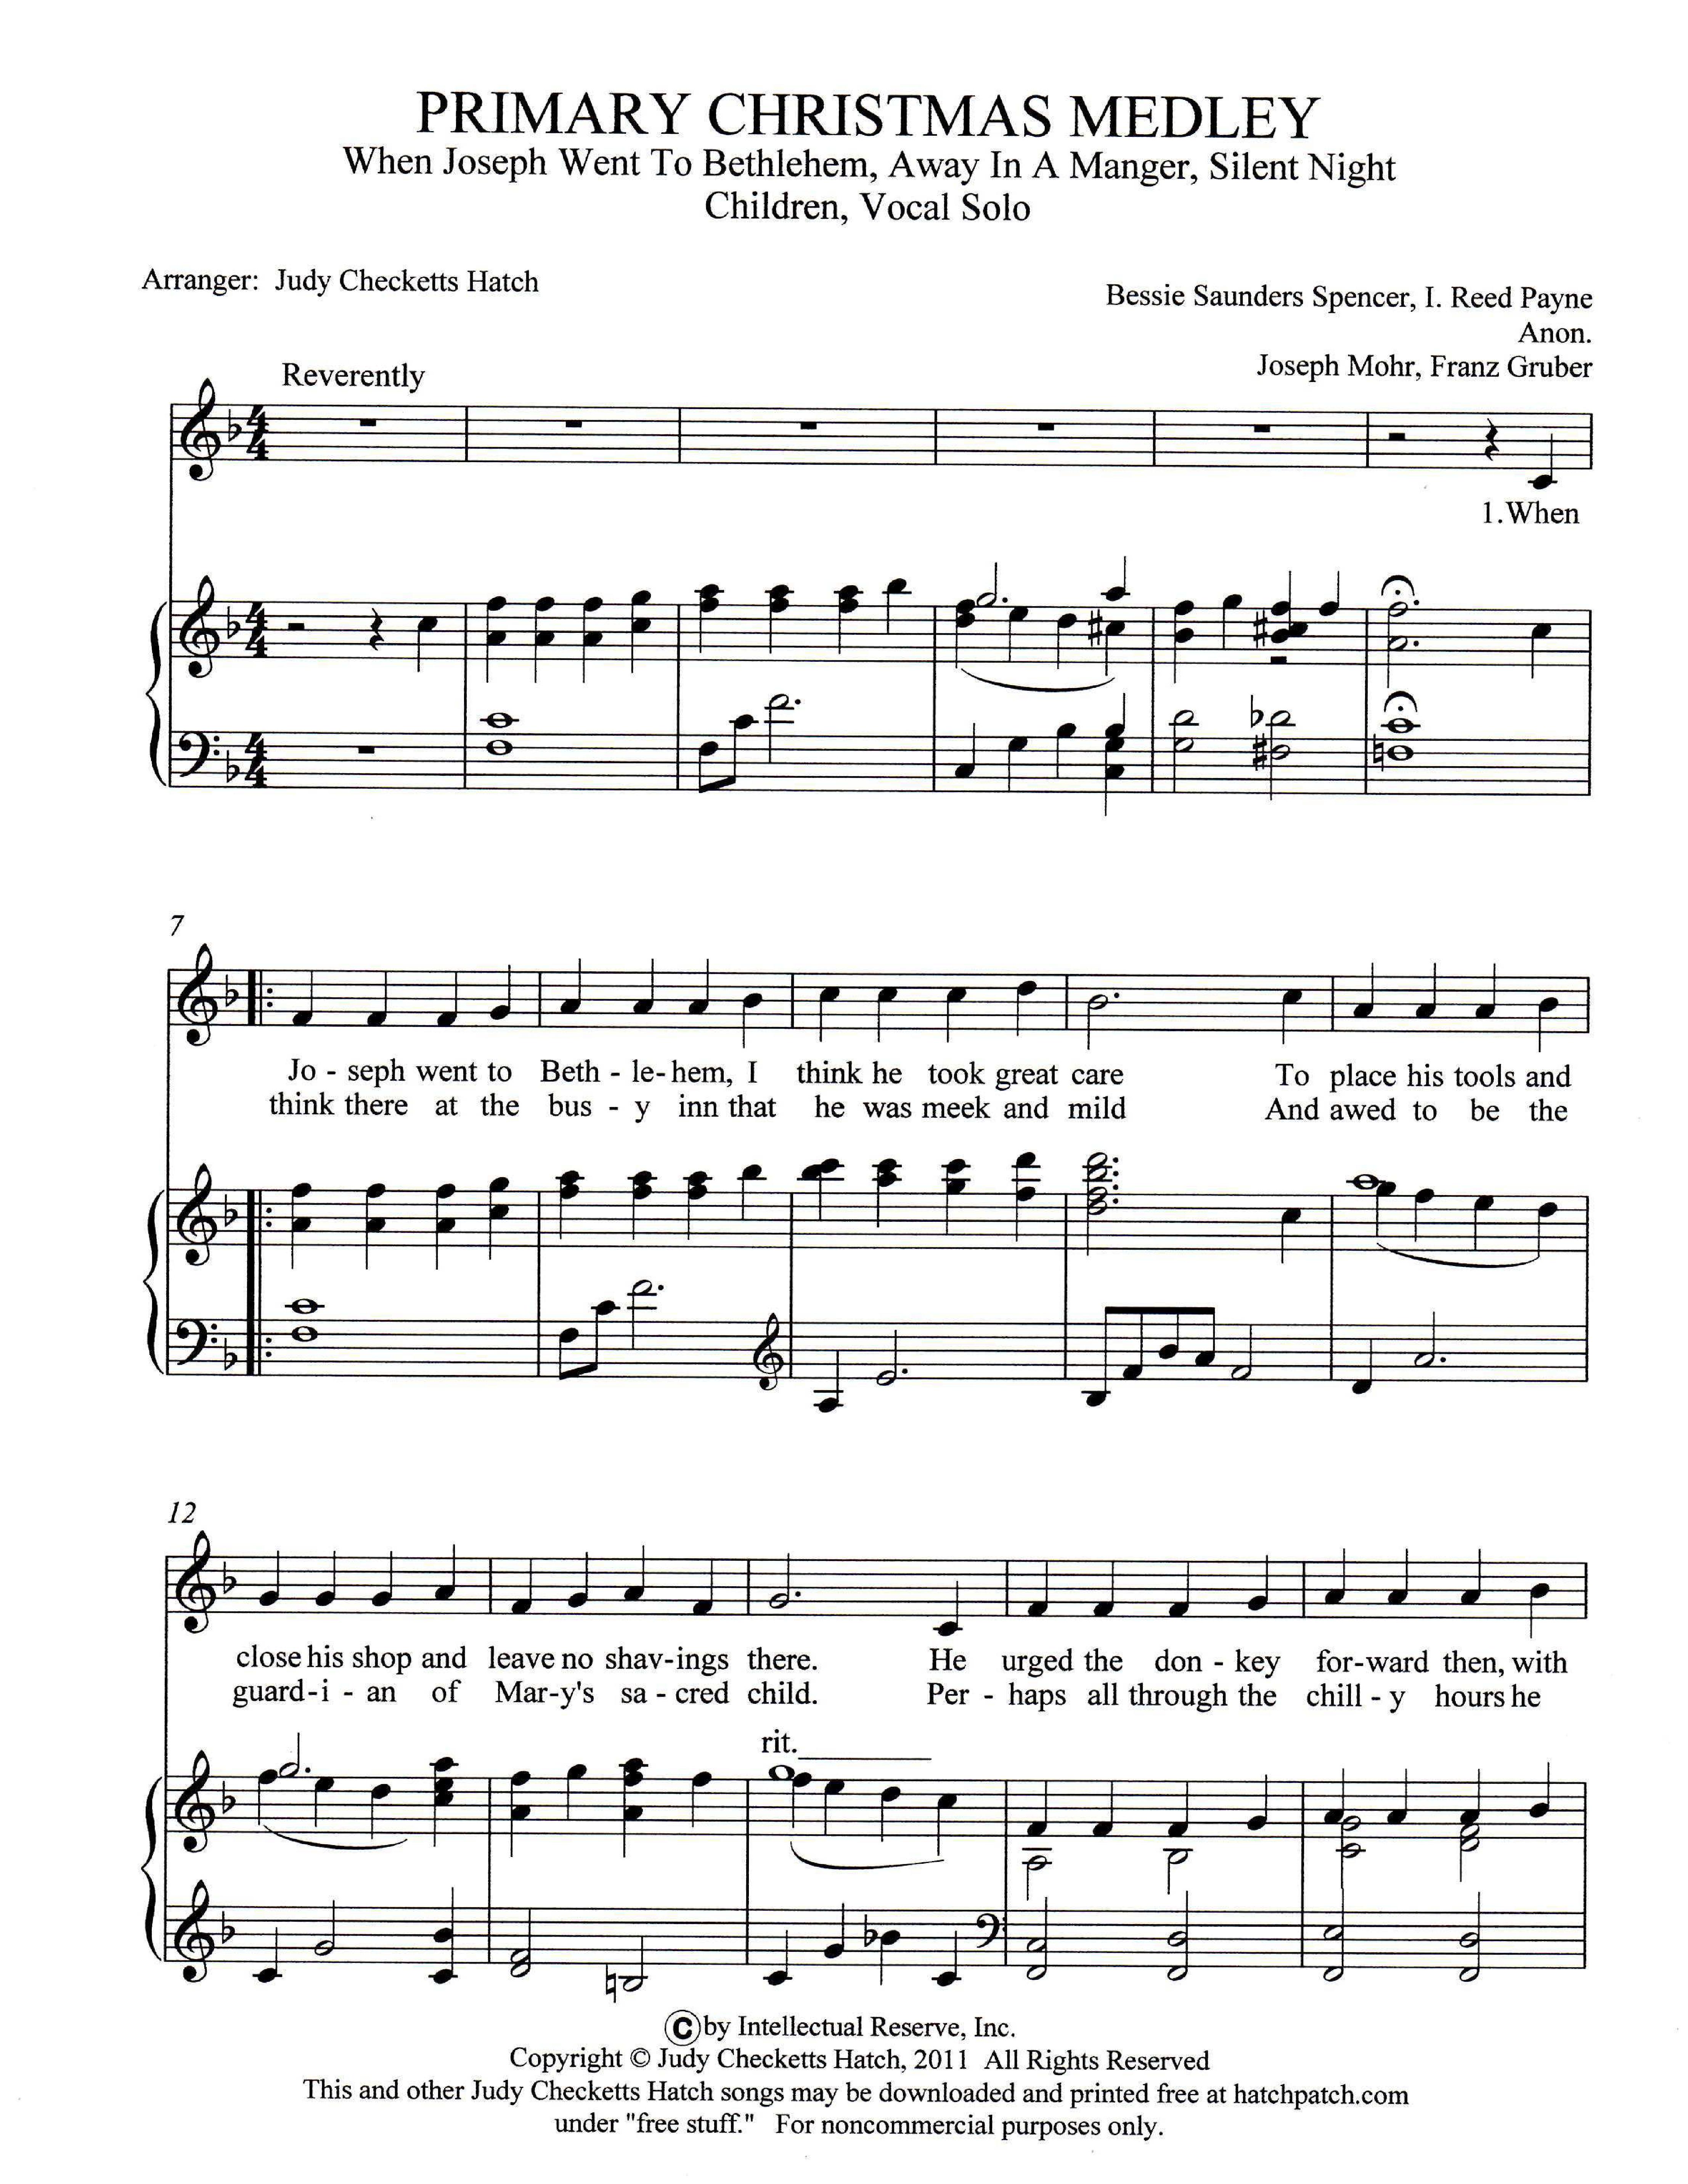 Free Christmas Sheet Music For Keyboard Printable – Festival Collections - Free Christmas Sheet Music For Keyboard Printable